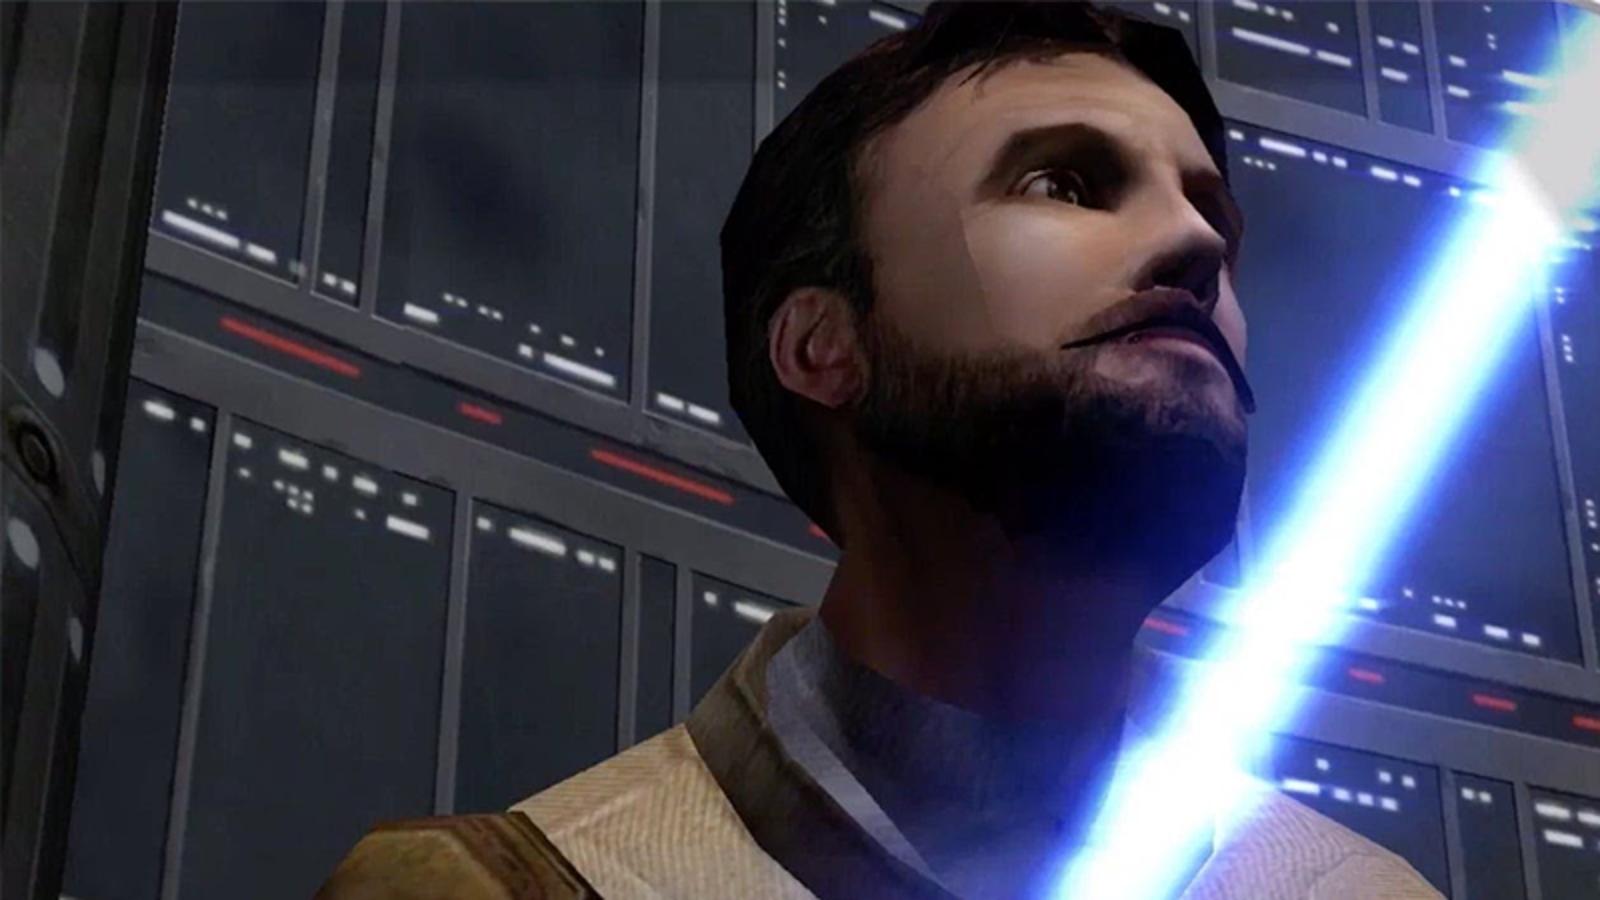 Star Wars Jedi Knight II, Jedi Academy Coming to Switch and PS4